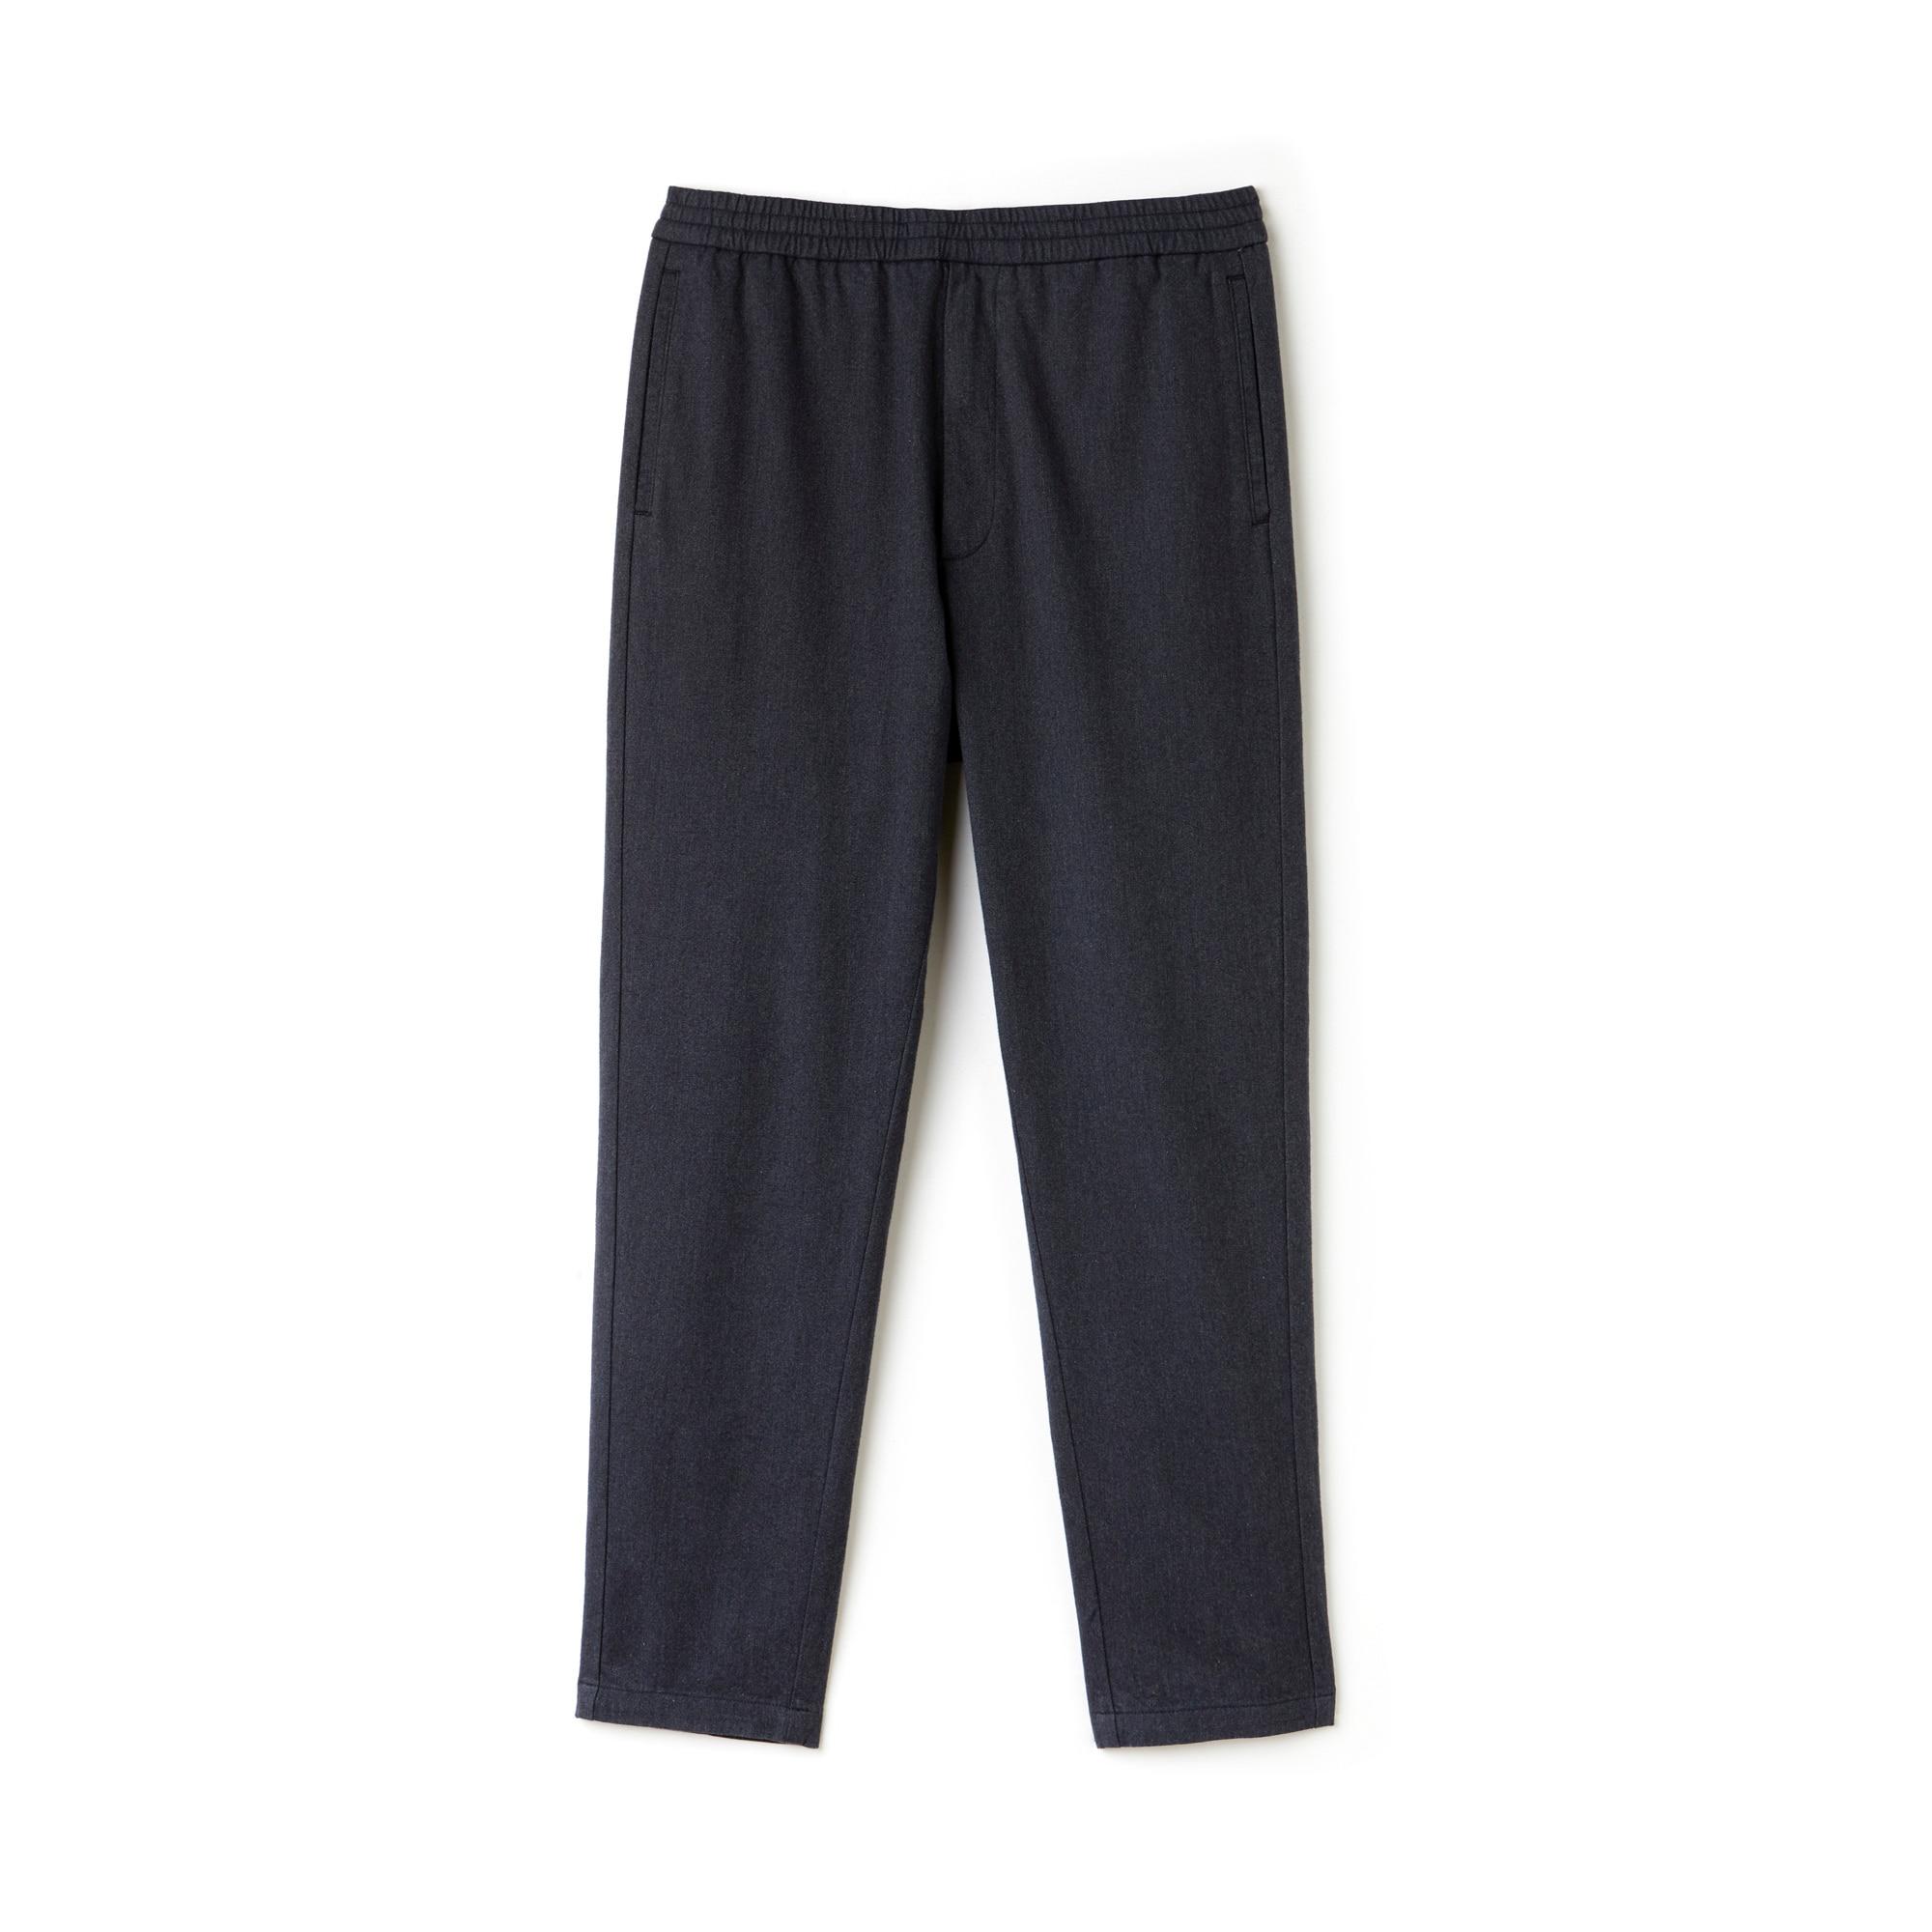 Men's Slim Fit Elasticized Cotton Twill Chino Pants